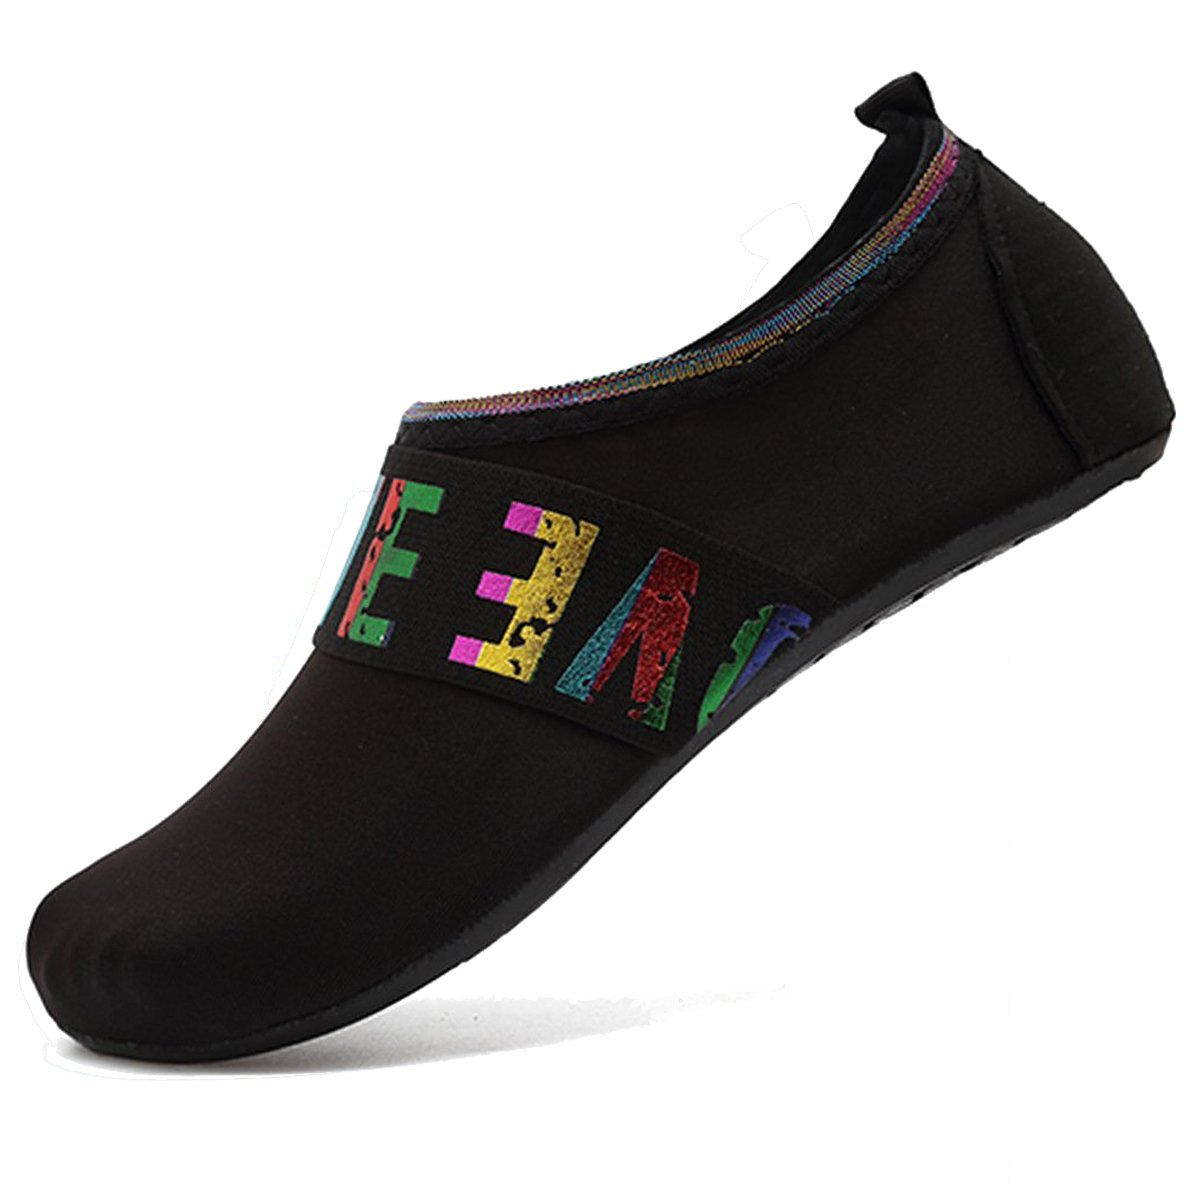 Unisex Womens Barefoot Quick-Dry Water Shoes Aqua Socks for Beach Pool Surf Yoga Love-Black 38-39